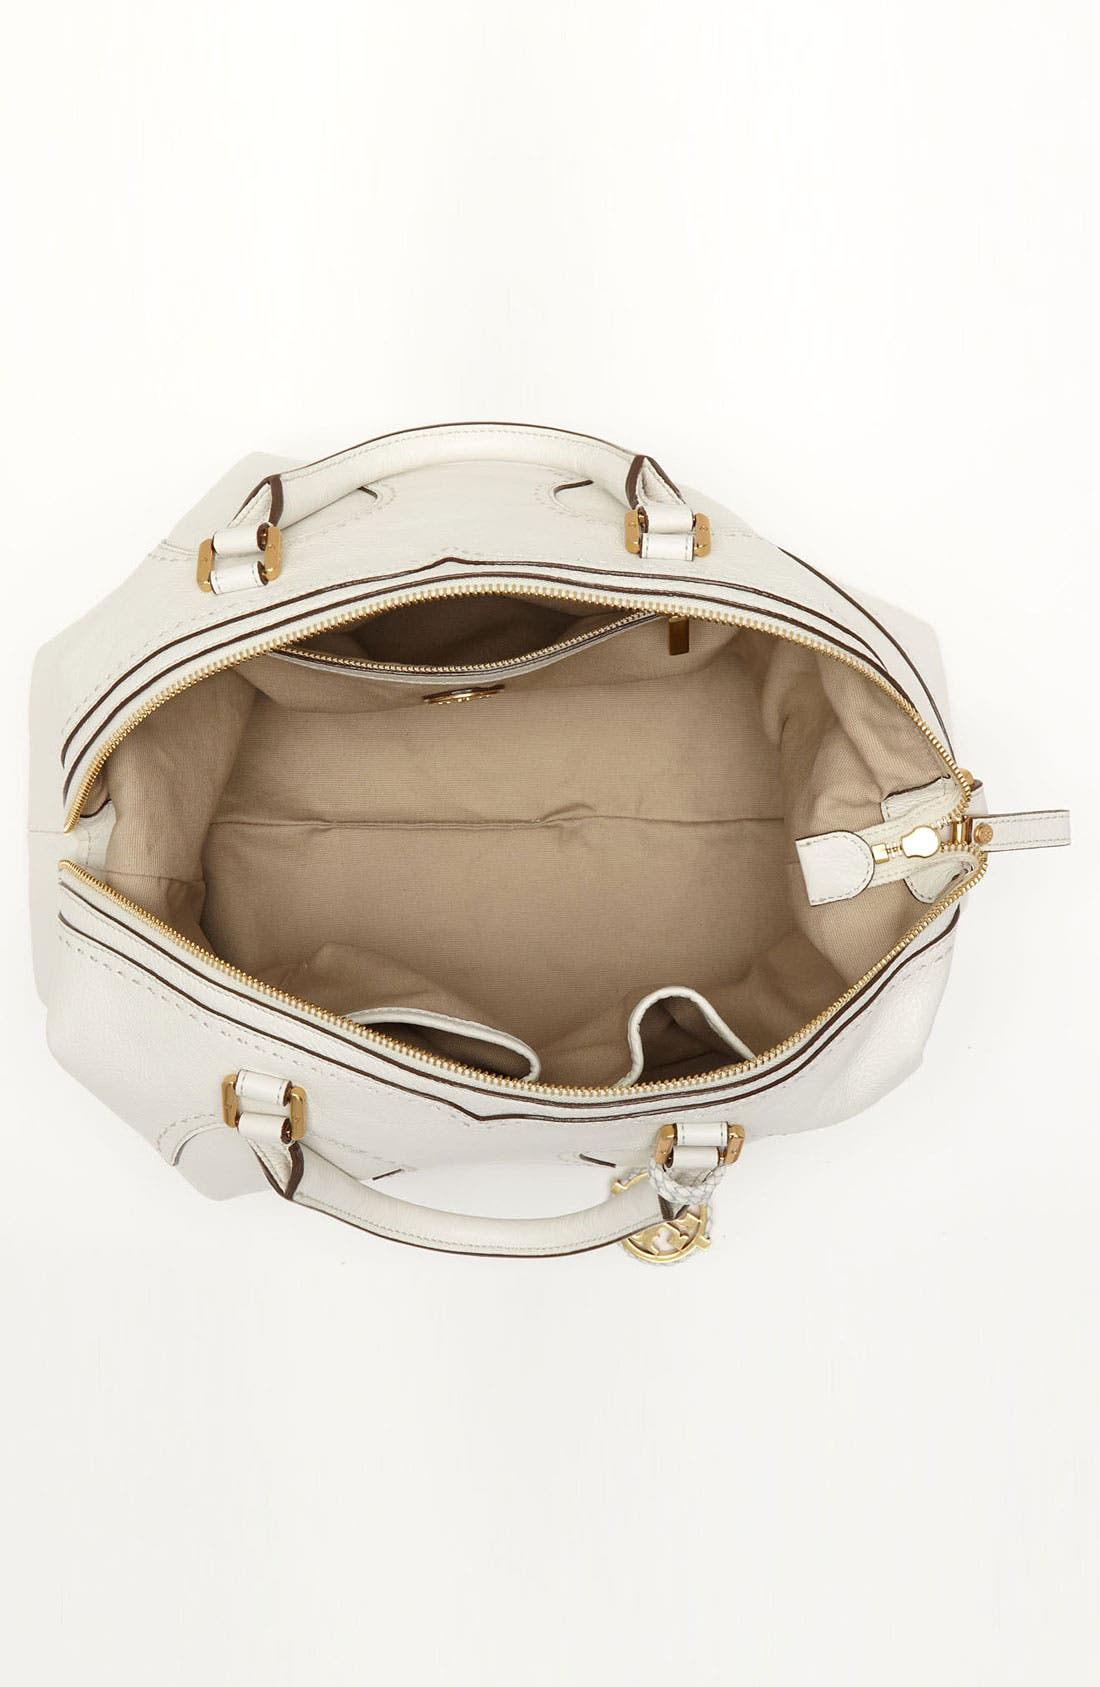 Alternate Image 3  - Tory Burch 'Amalie' Leather Satchel